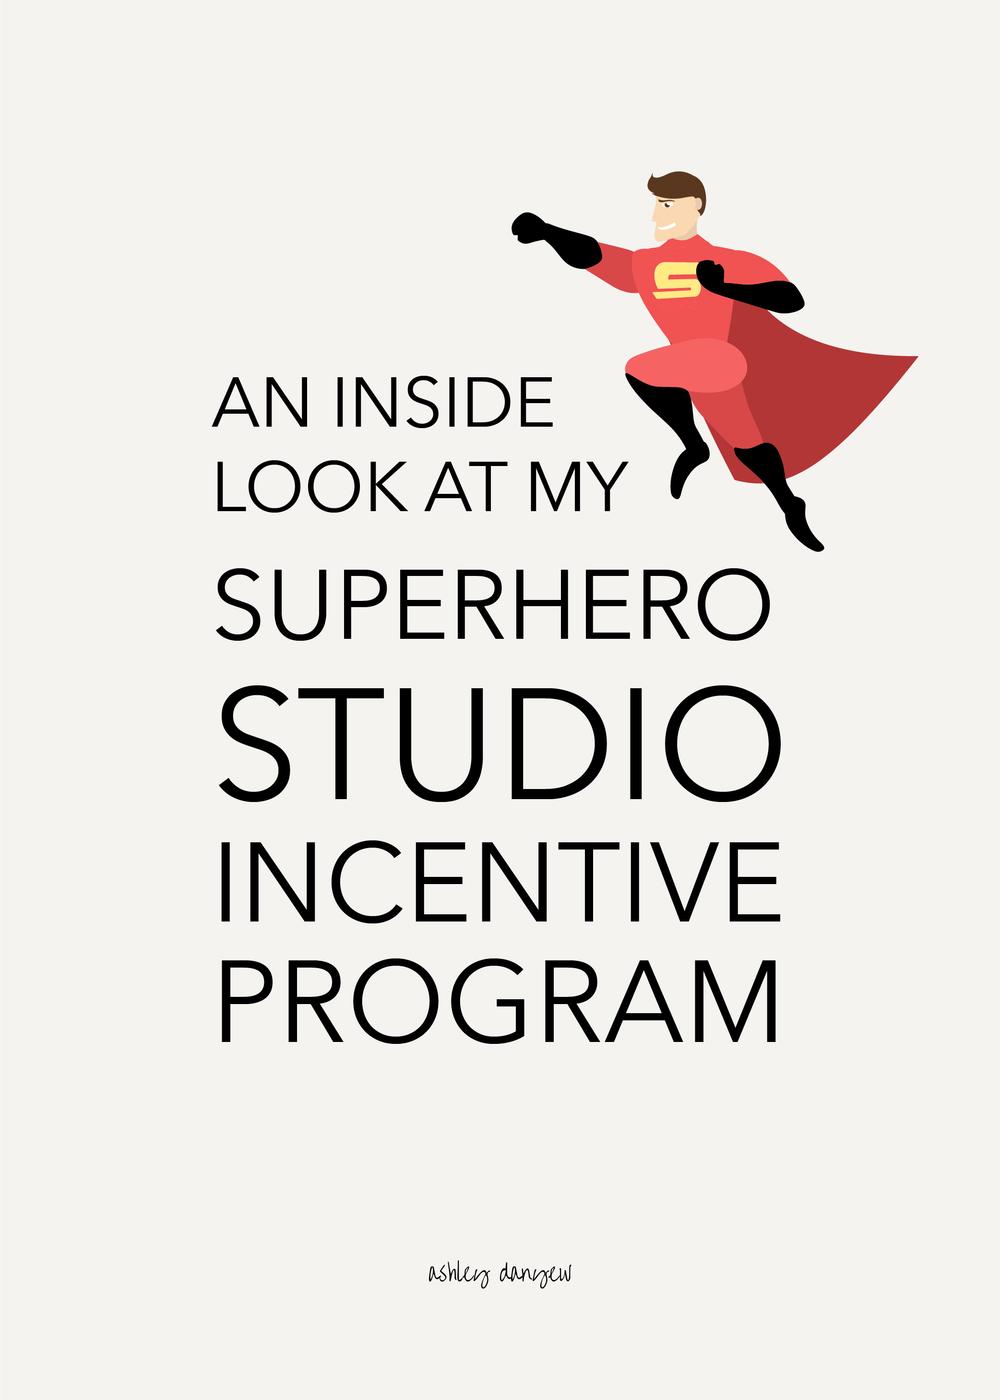 An Inside Look at My Superhero Studio Incentive Program-11.png